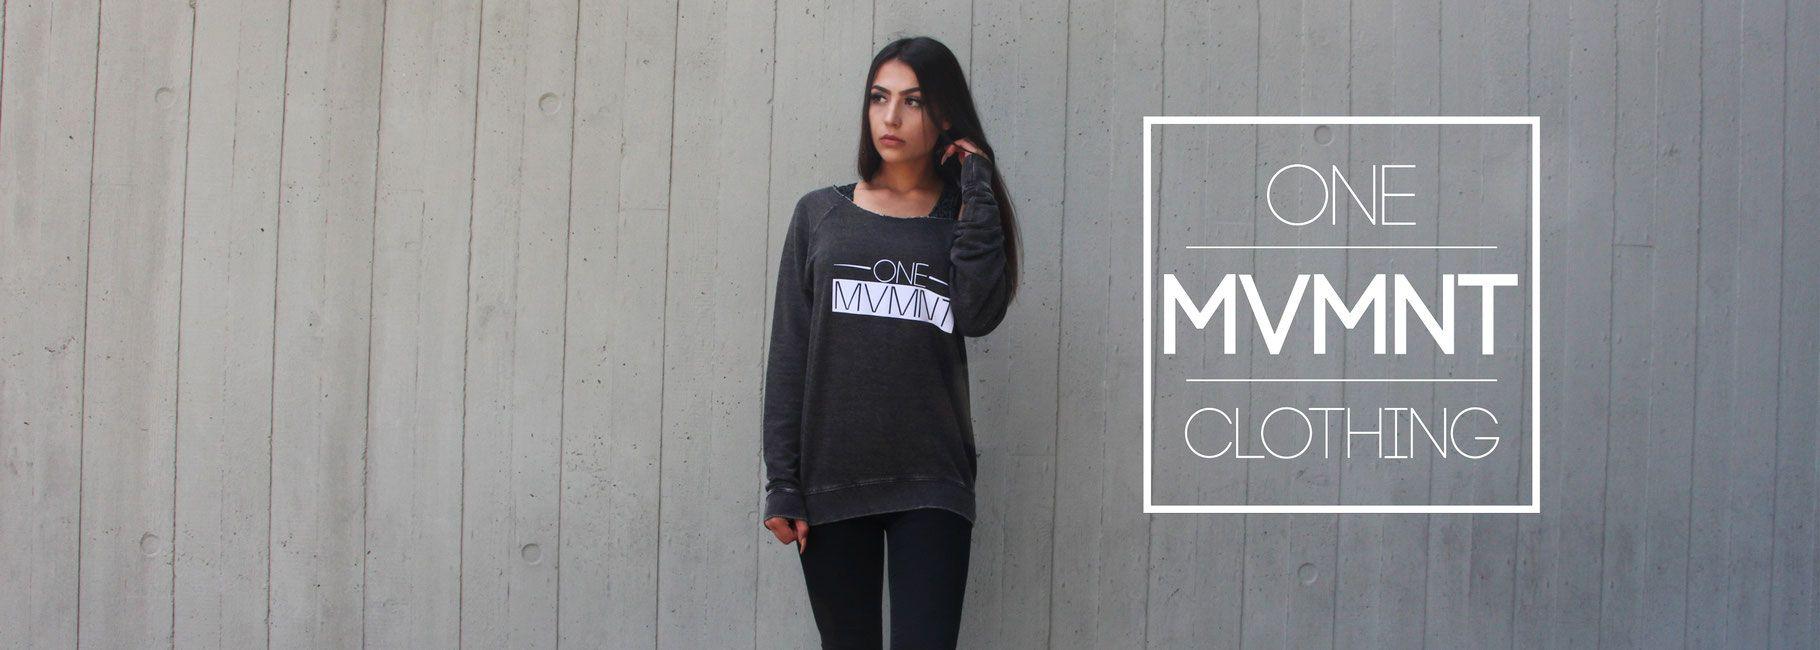 One MVMNT - fashion & lifestyle